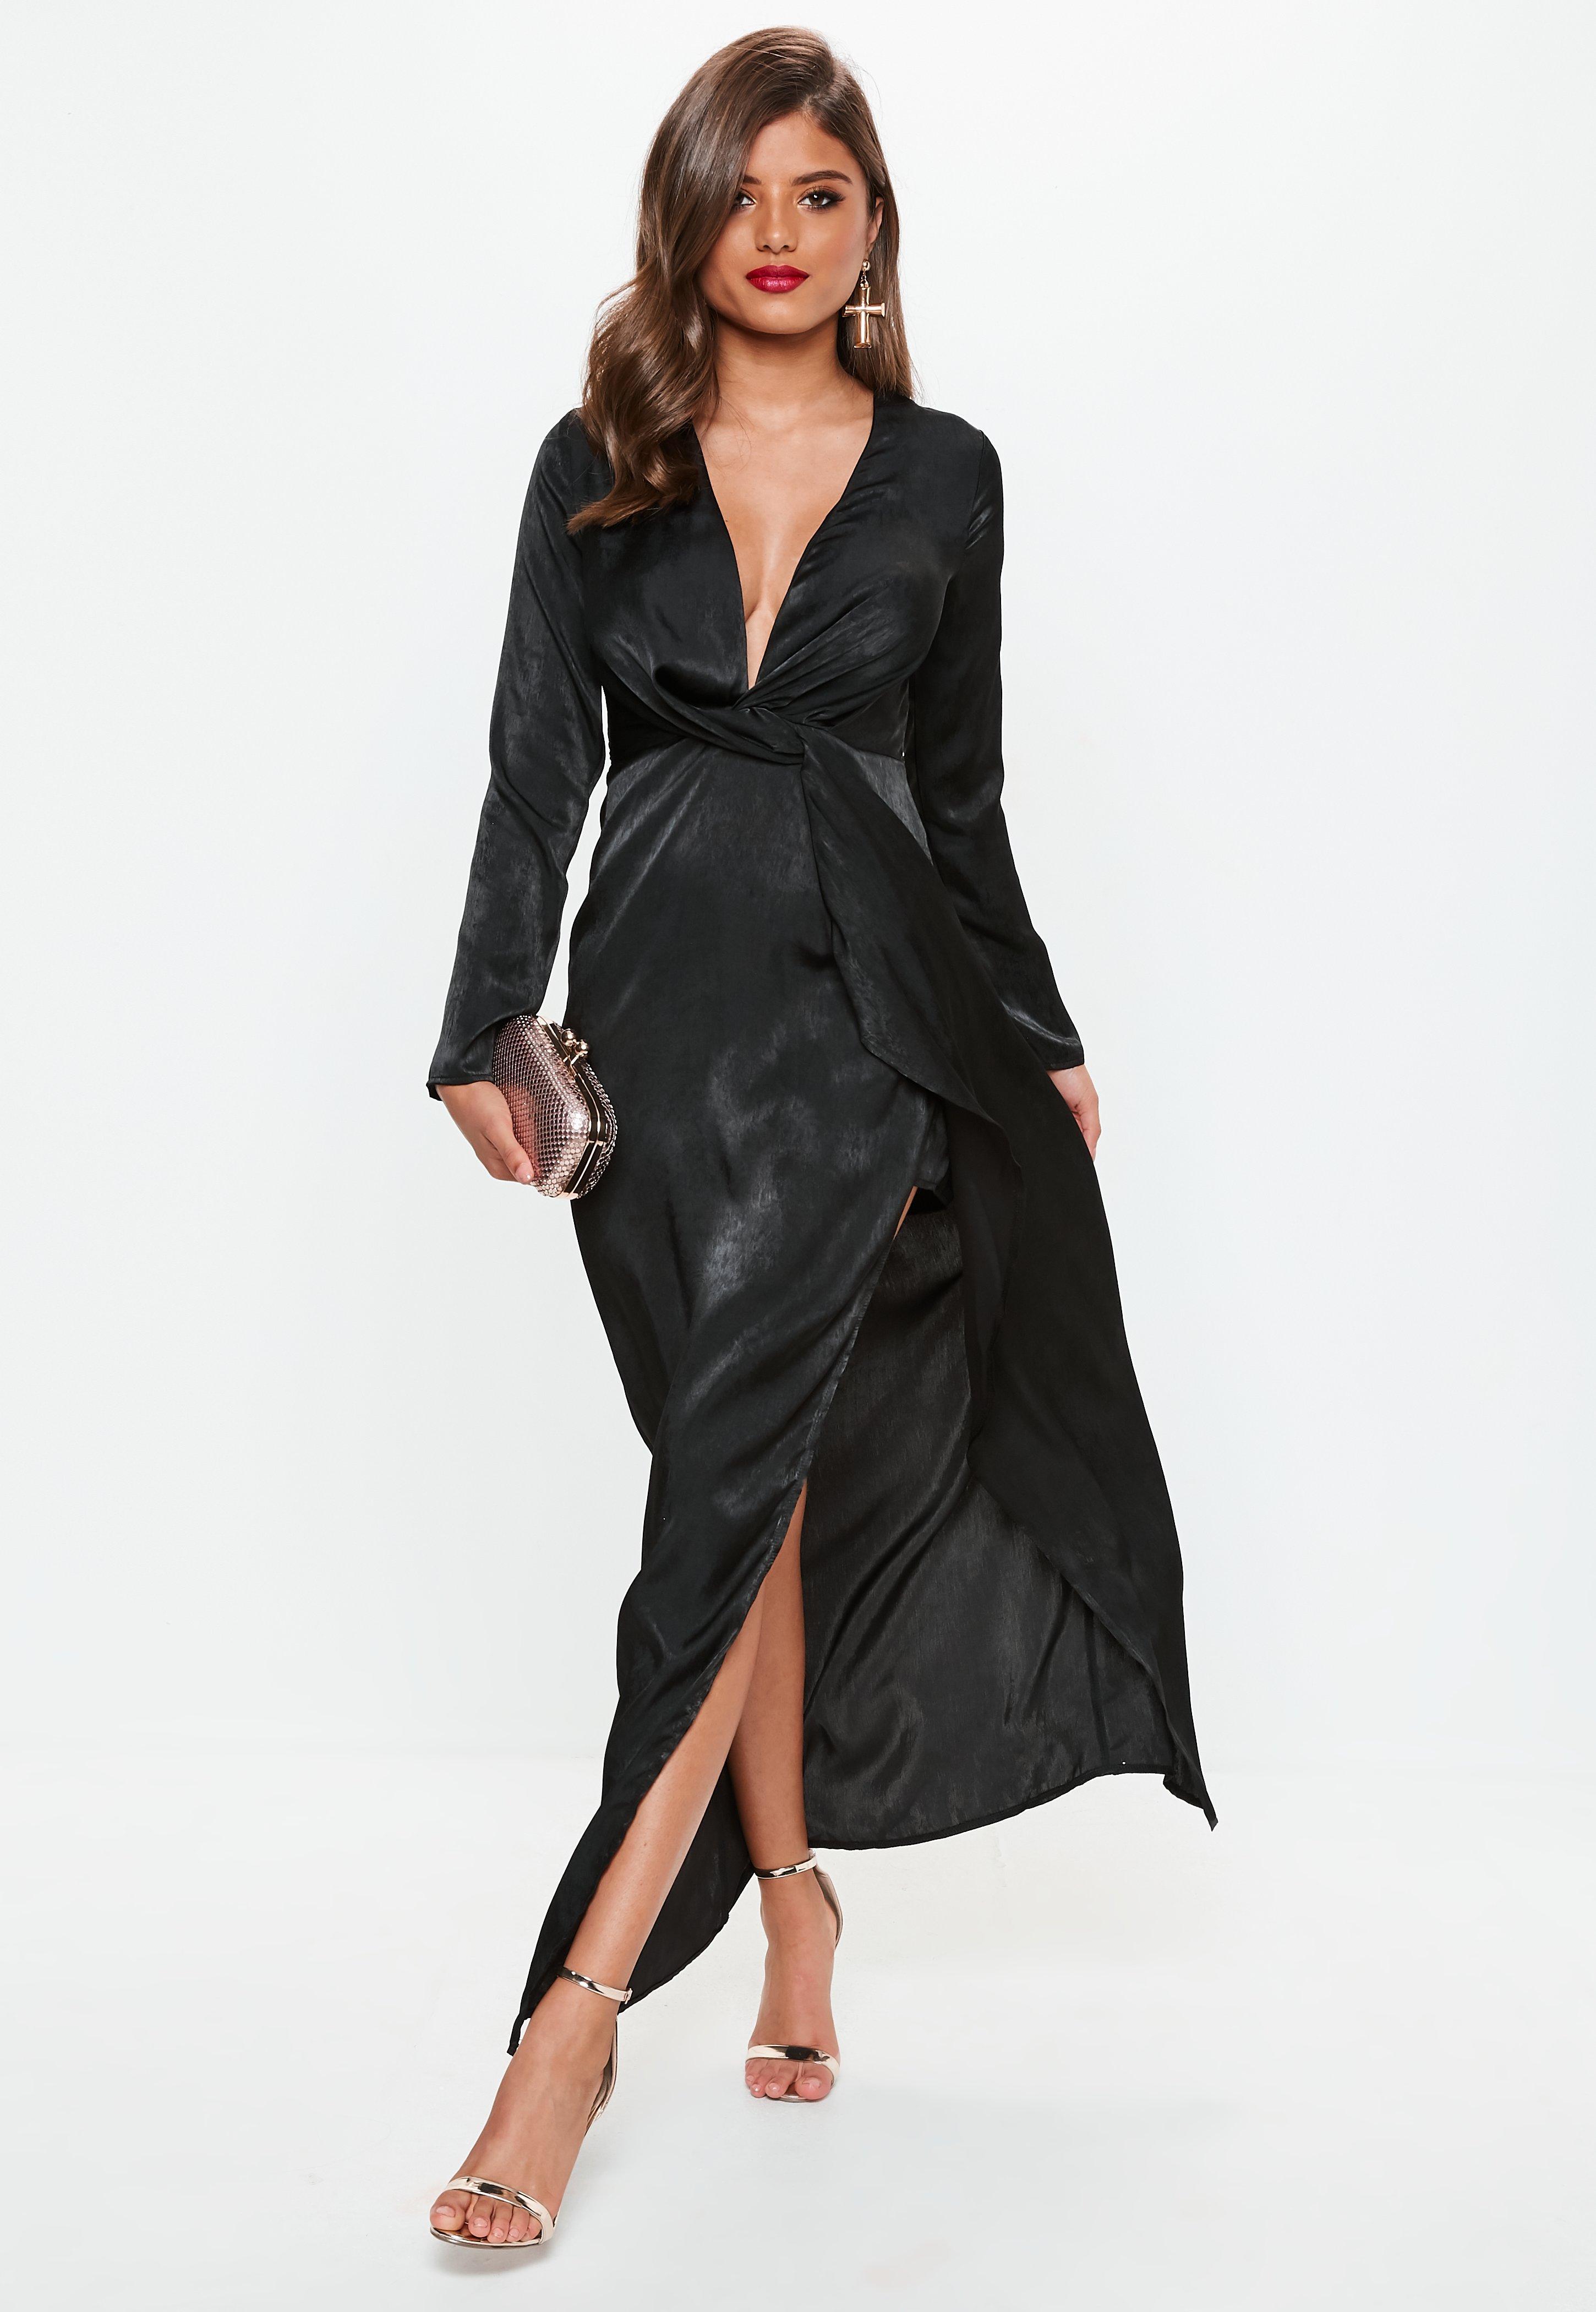 Black Lace Strapless Long Summer Dresses